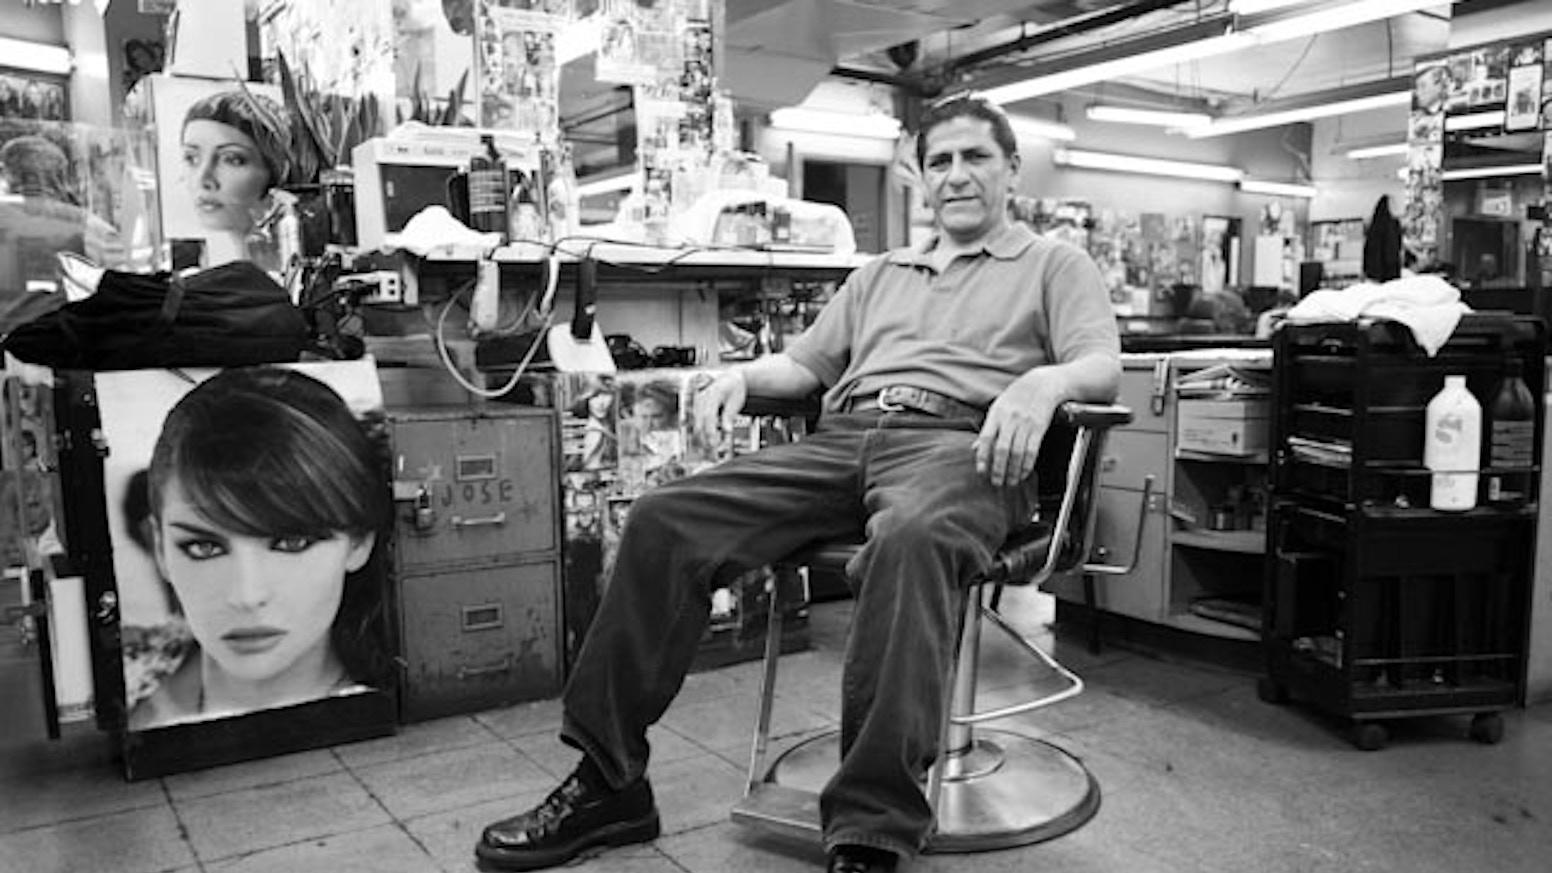 Astor Barber Documentary By Karen Gehres Kickstarter